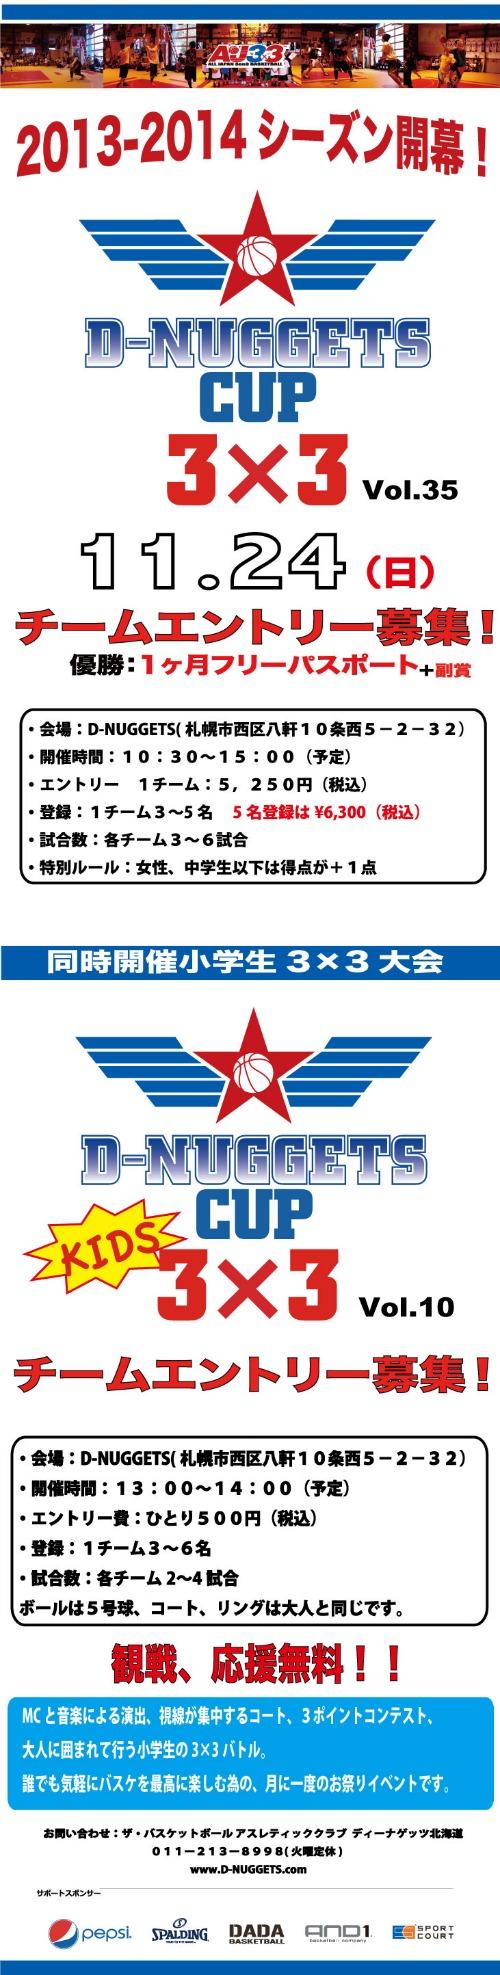 D-NUGGETS-CUP-HOKKAIDO-Vol.35.jpg